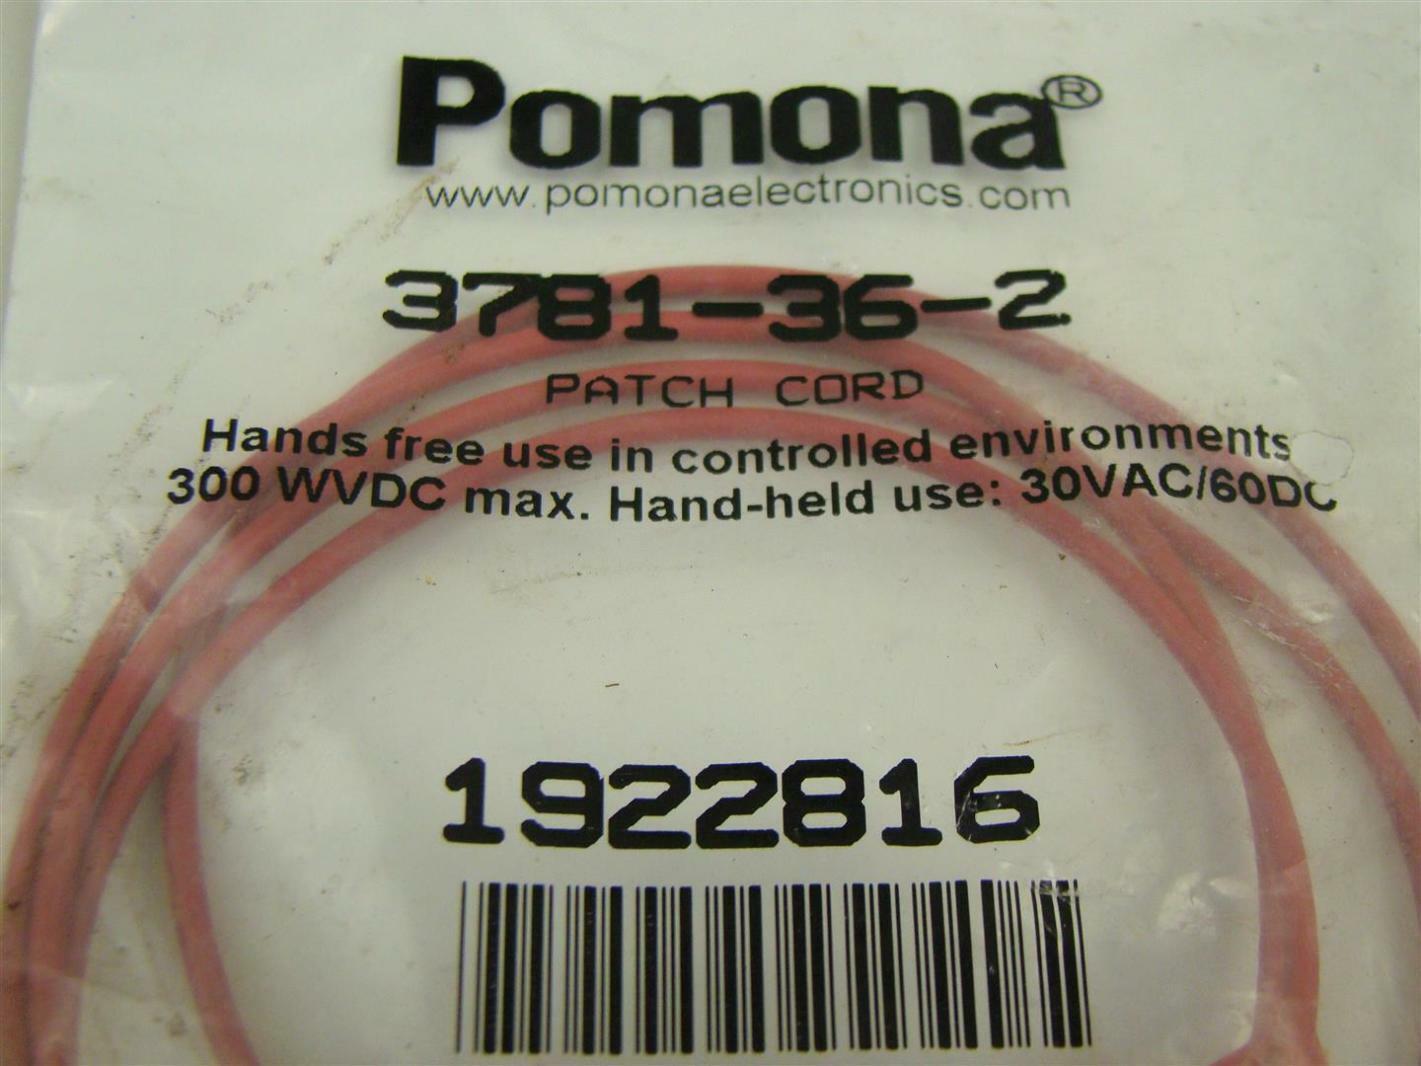 Pomona Patch Cord 3781-36-2